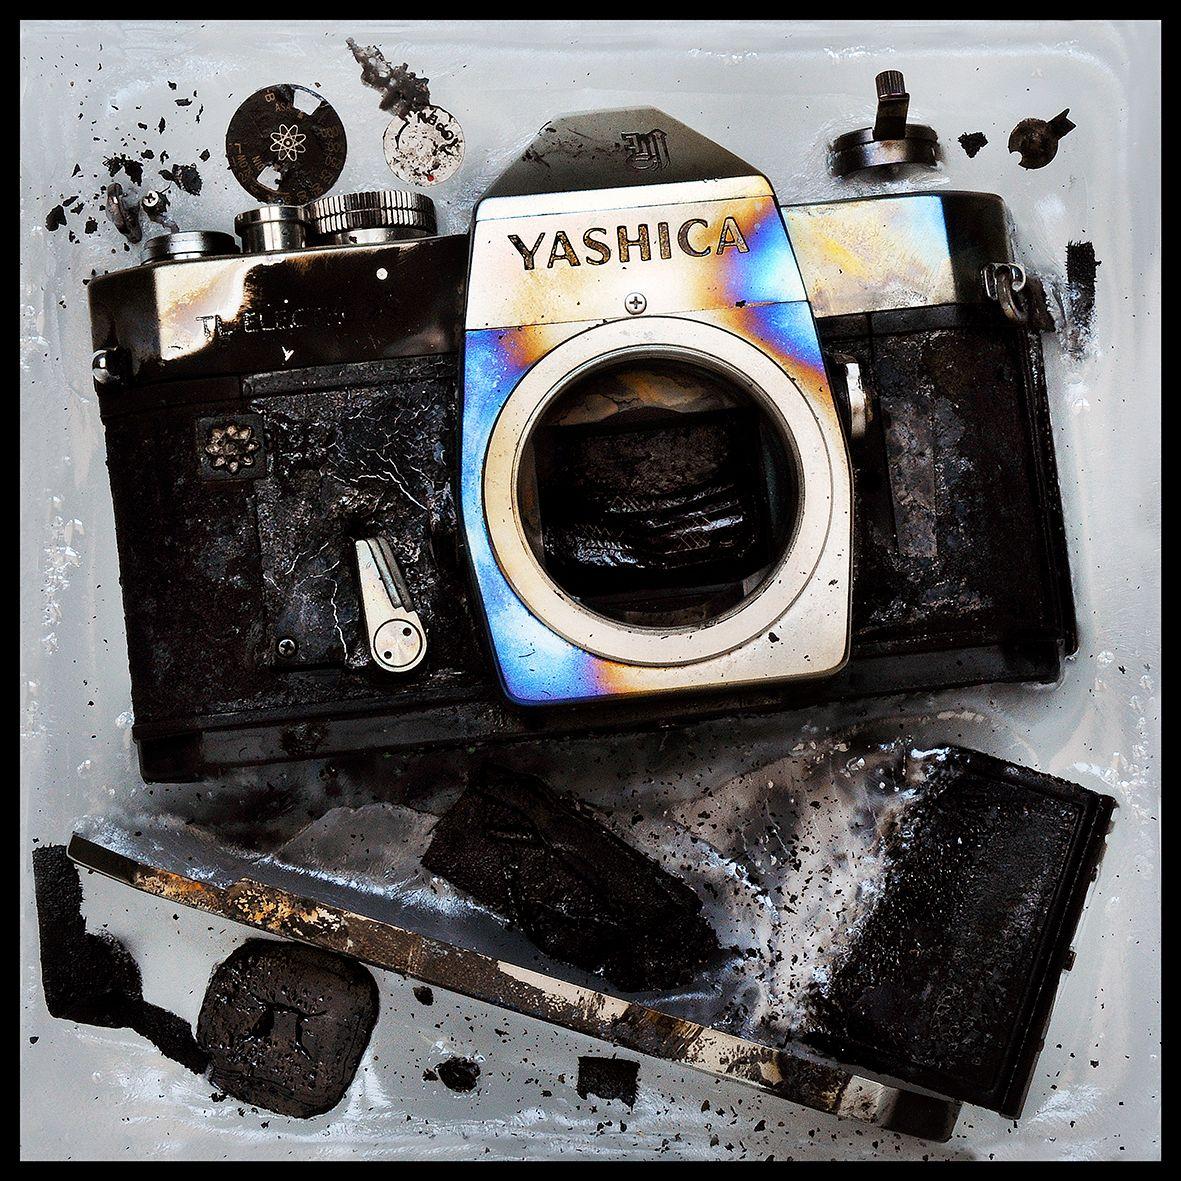 Blue Yashica DSC_8937 B.jpg